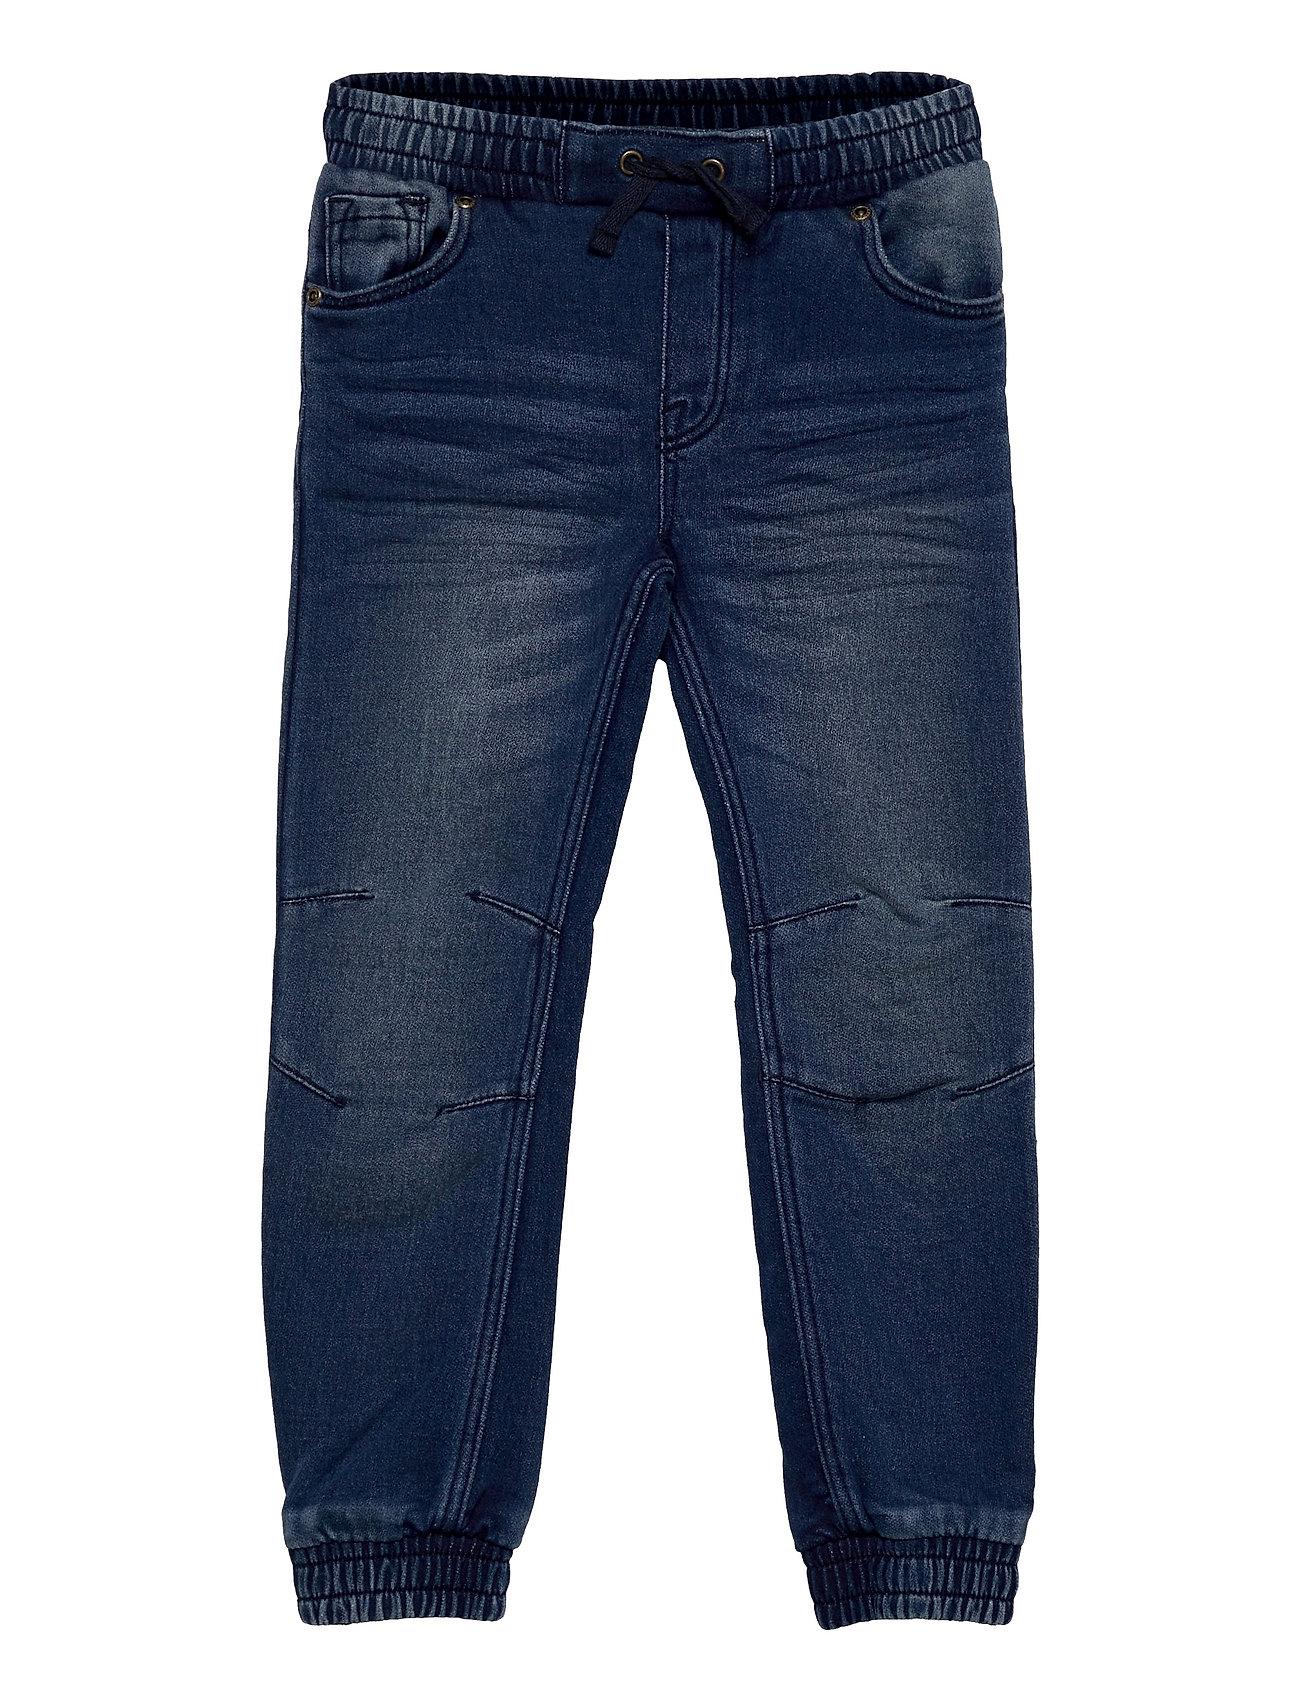 Jeans Regular Preschool Jeans Blå Polarn O. Pyret